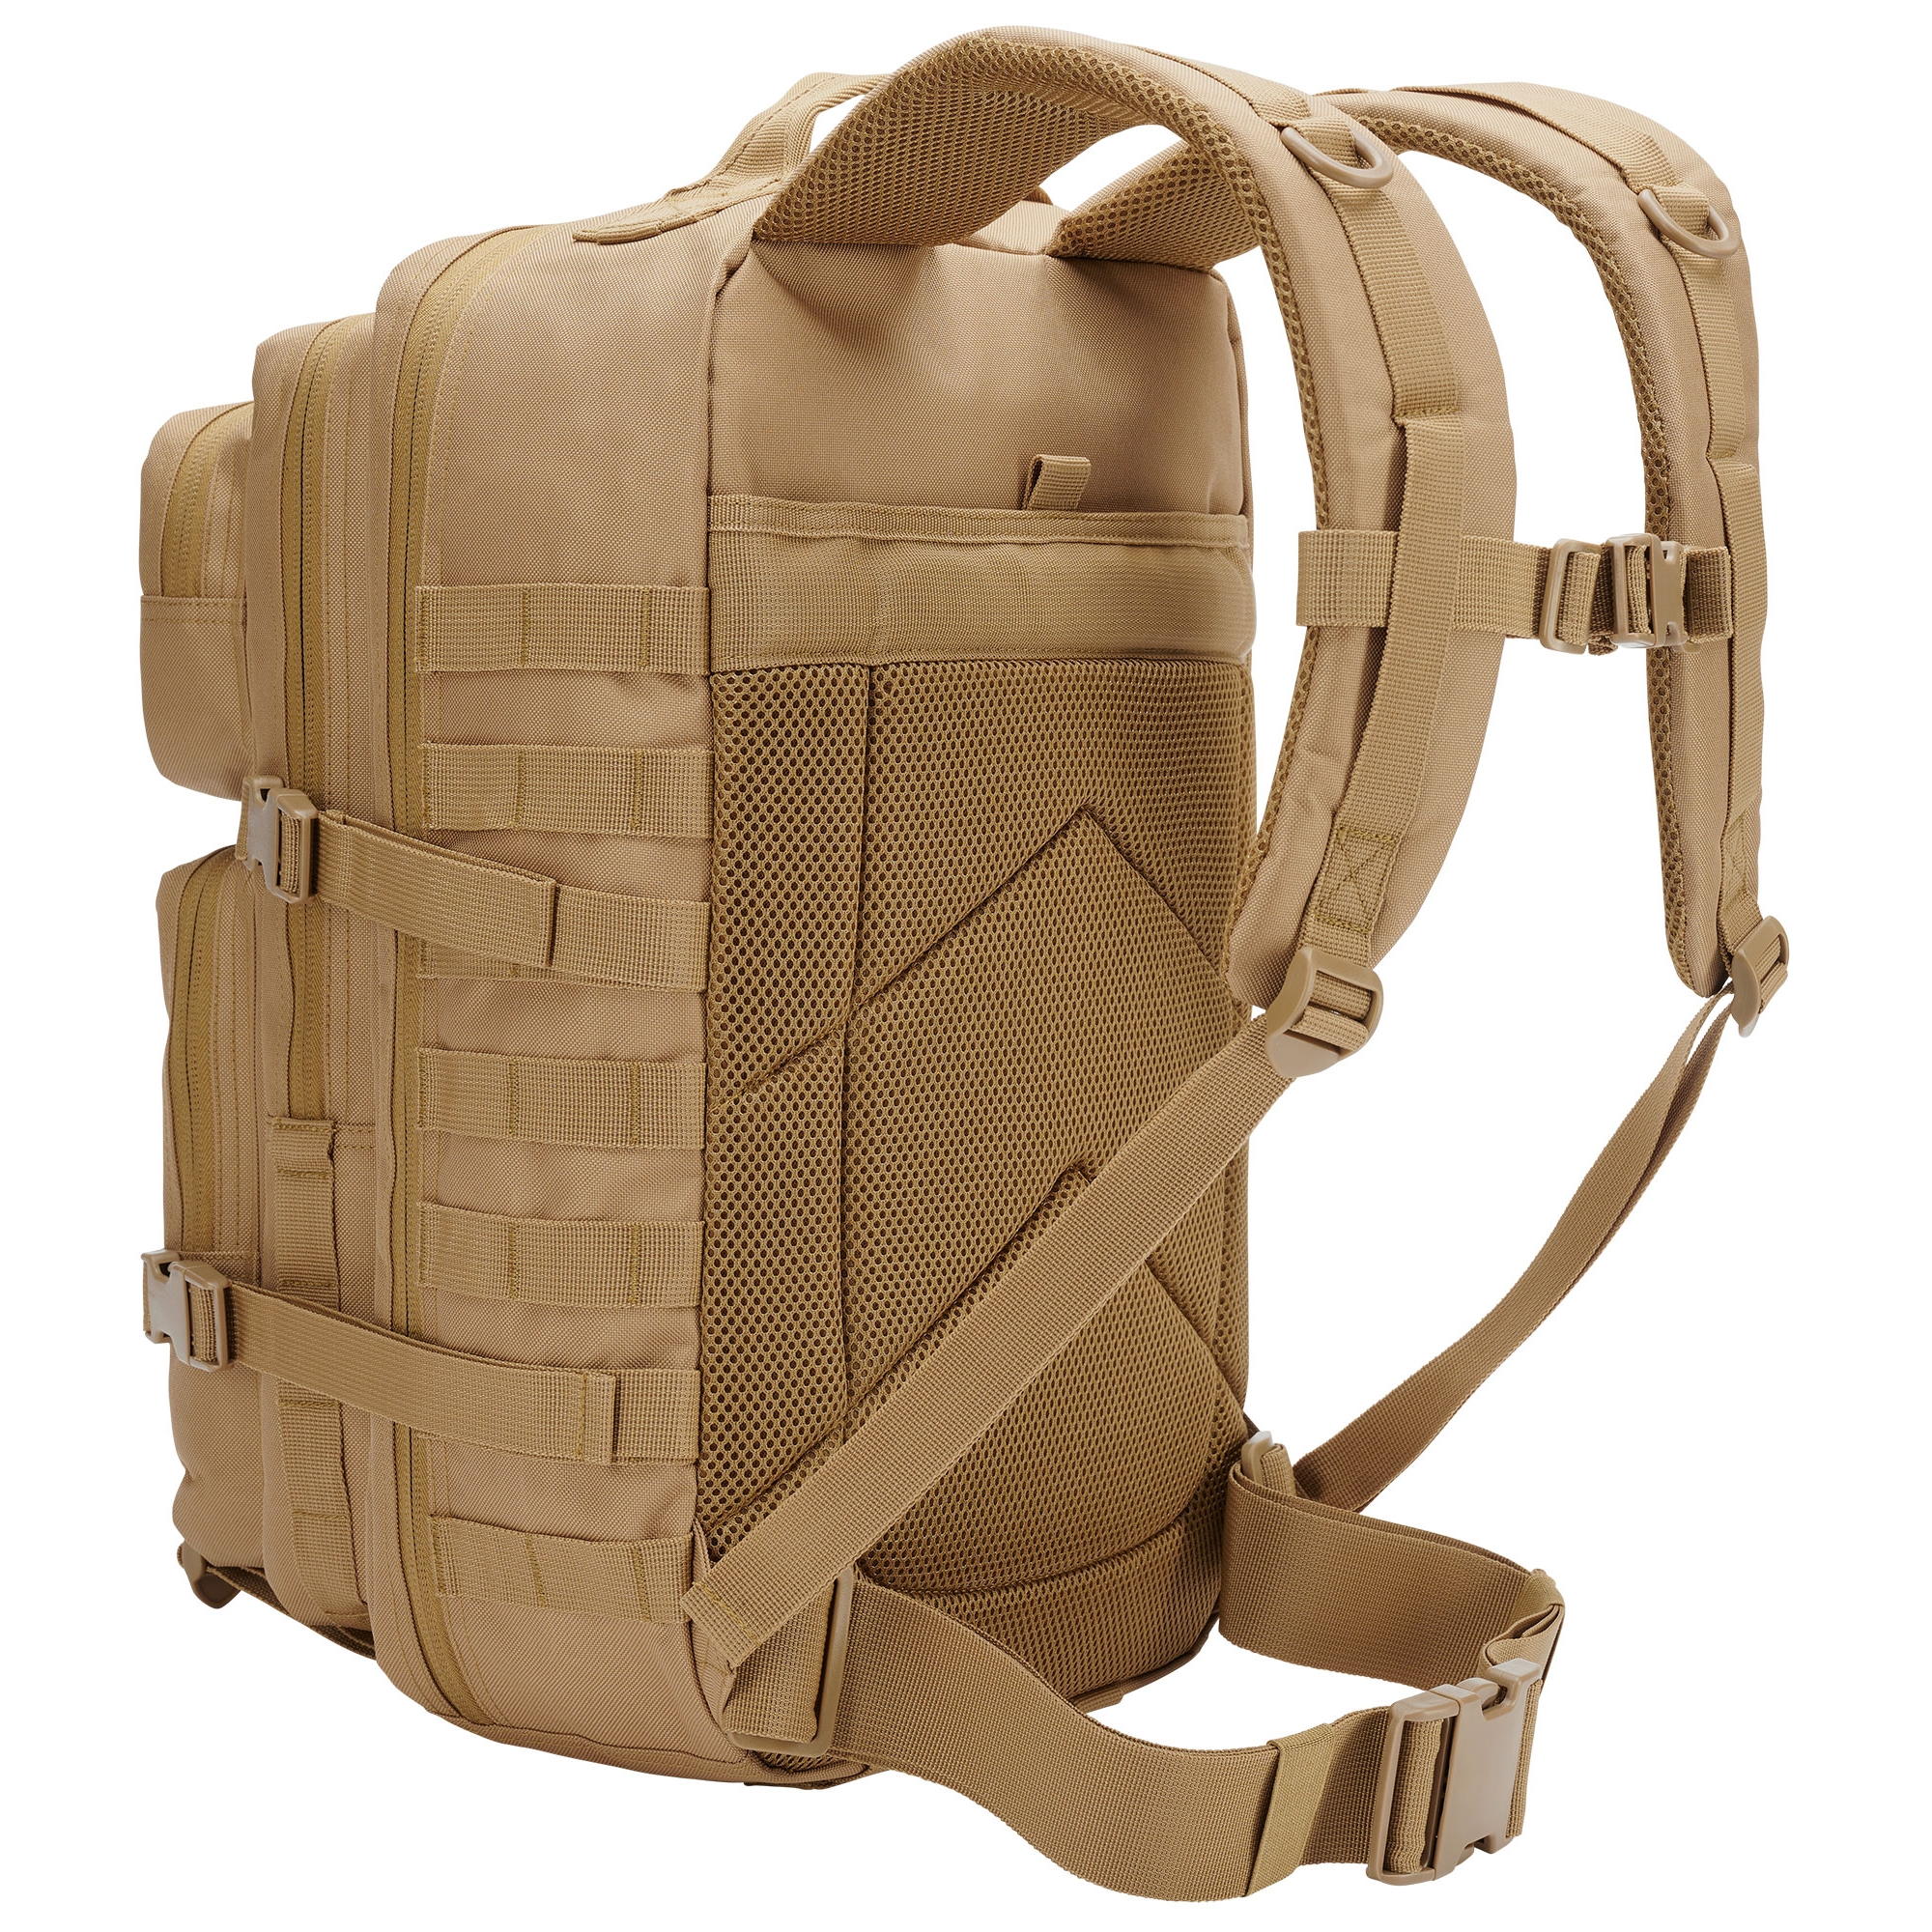 Indexbild 7 - Brandit US Cooper Rucksack Molle Backpack Bundeswehr Armee Wandern Reise Tactica